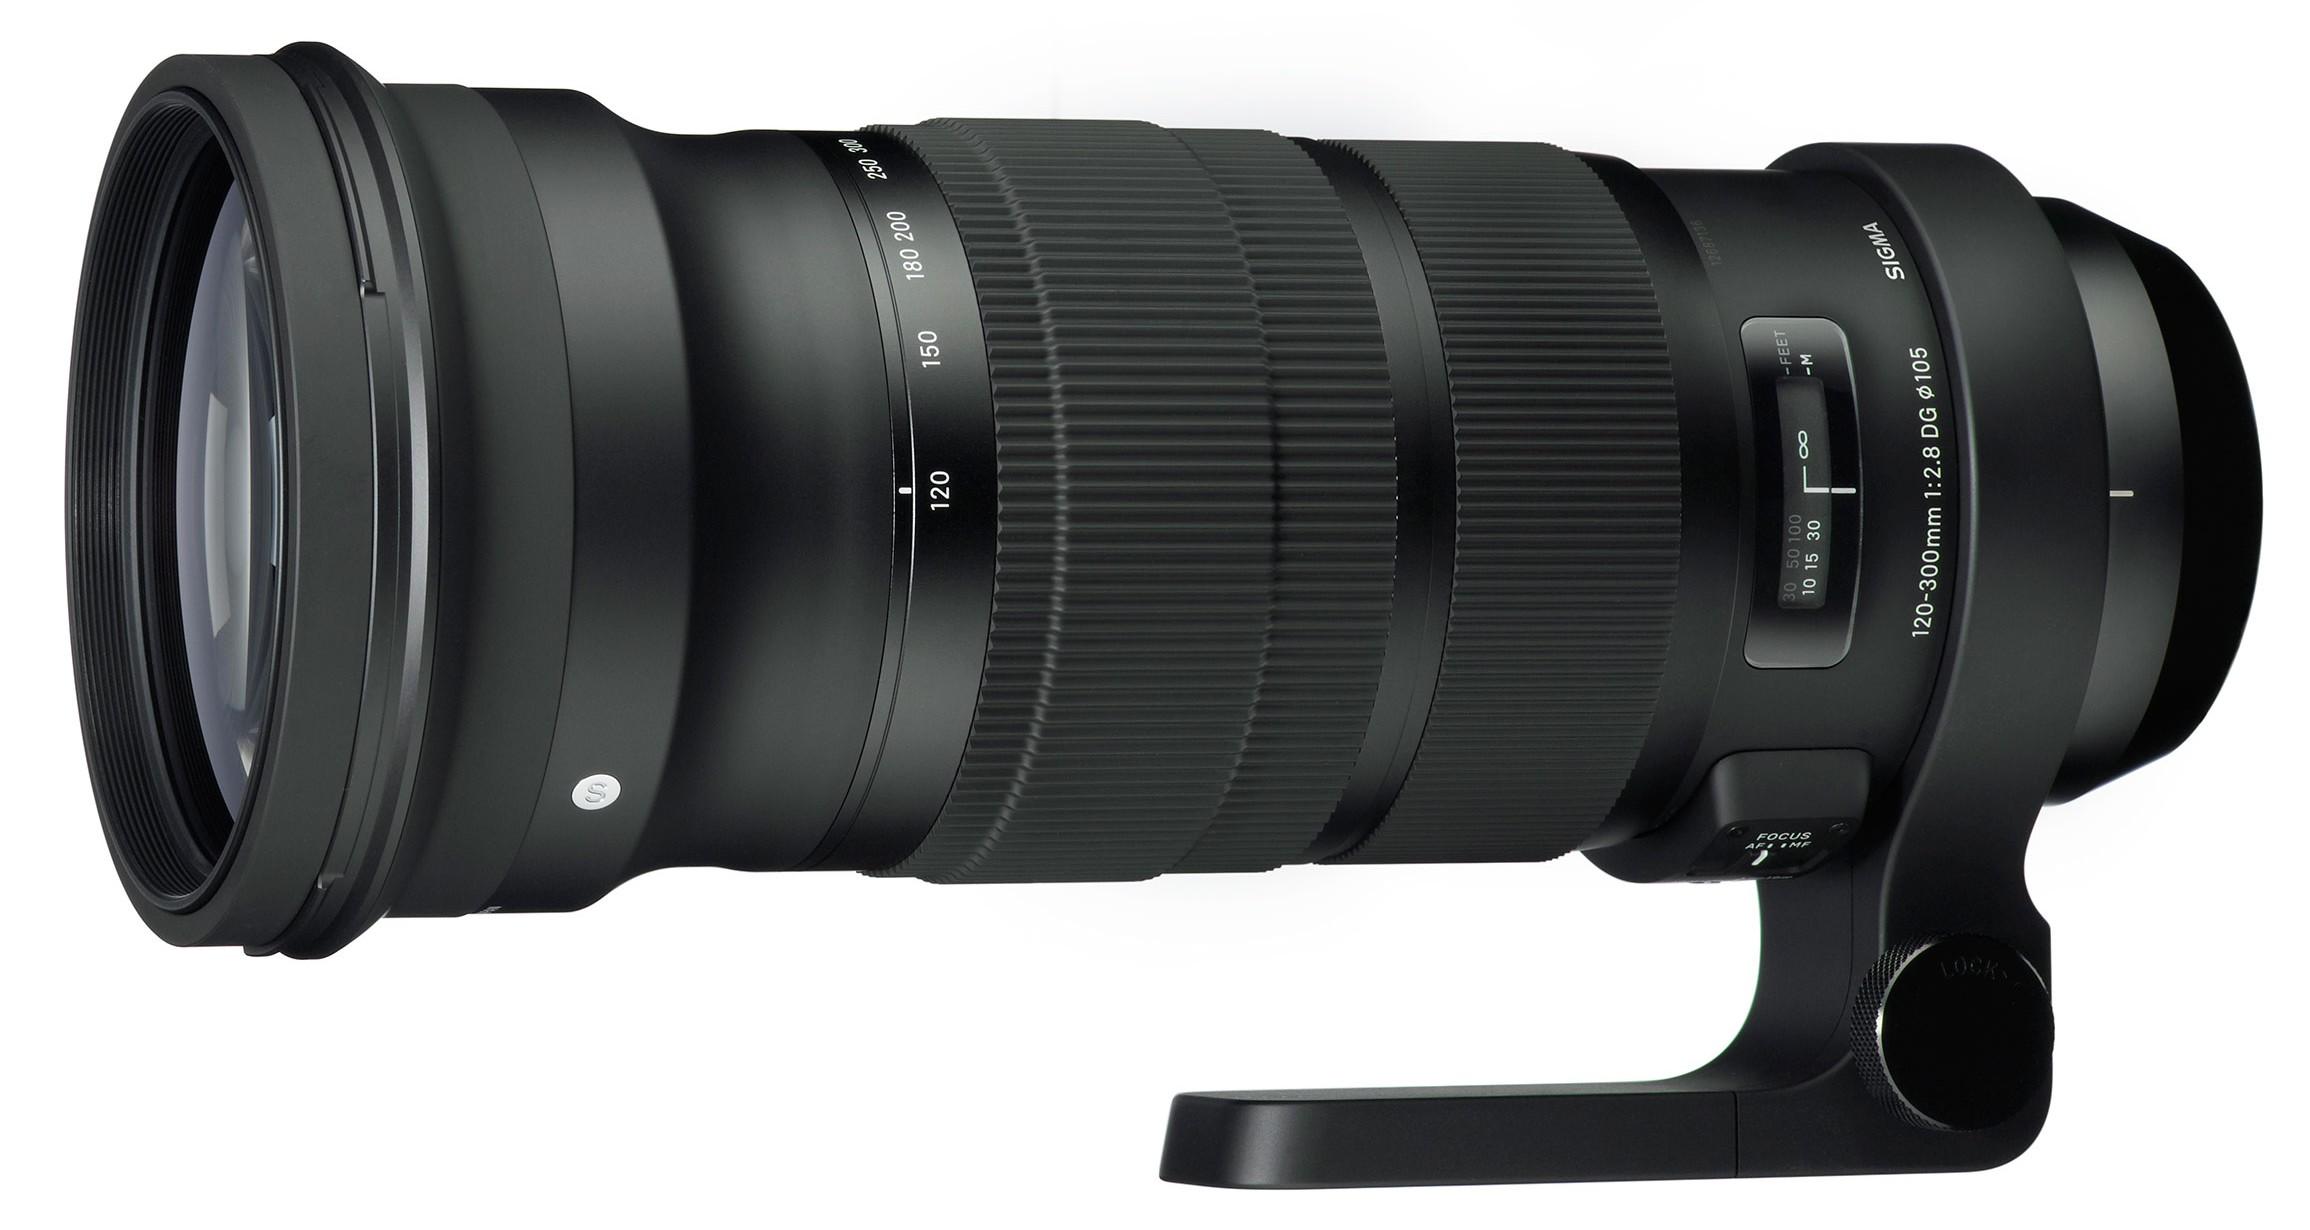 Sigma-120-300mm-f2.8-DG-OS-HSM